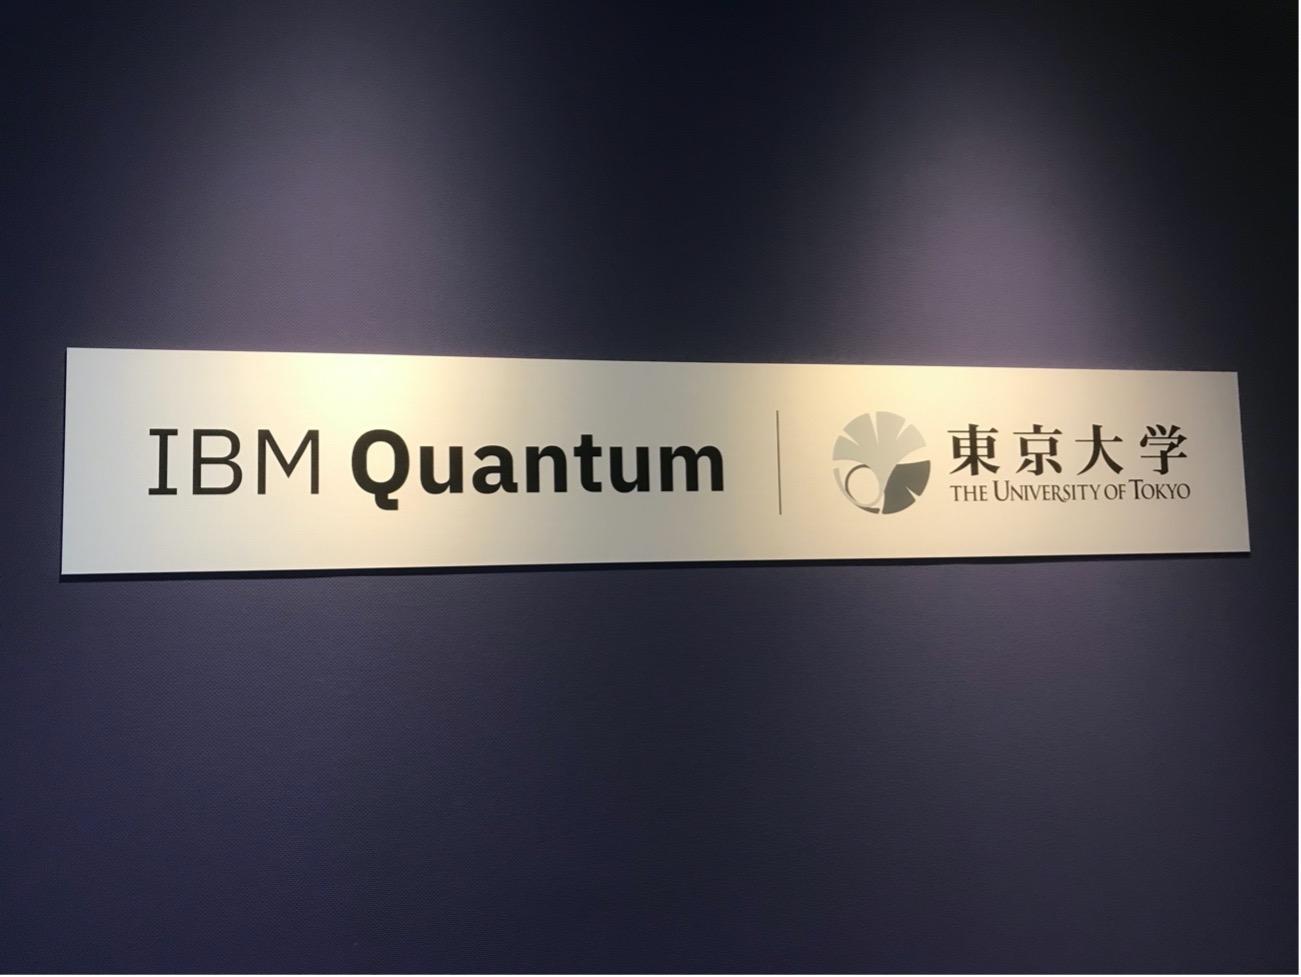 The University of Tokyo – IBM Quantum Hardware Test Center